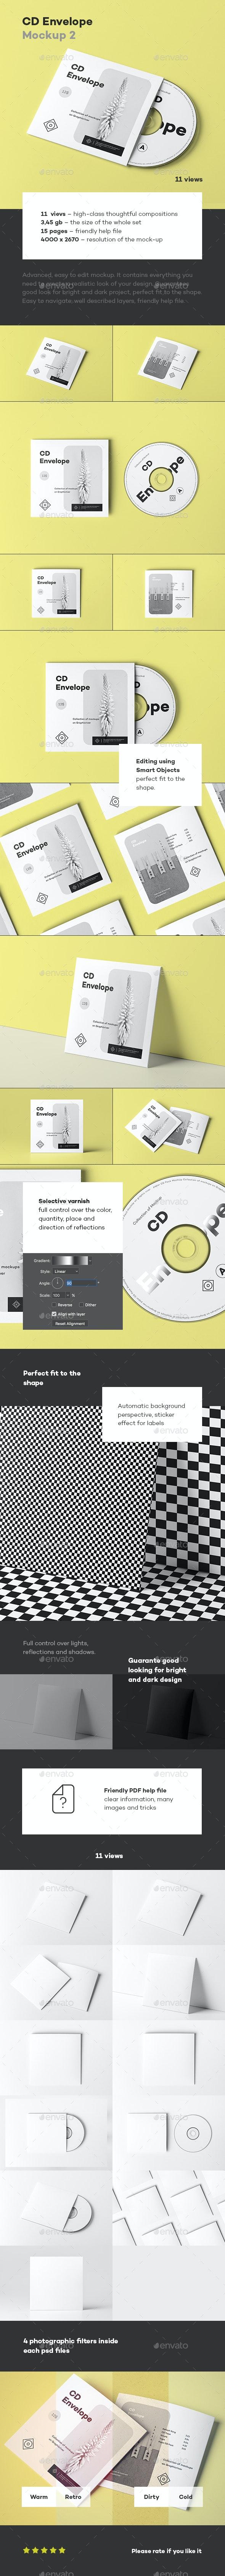 CD Envelope Mock-up 2 - Discs Packaging